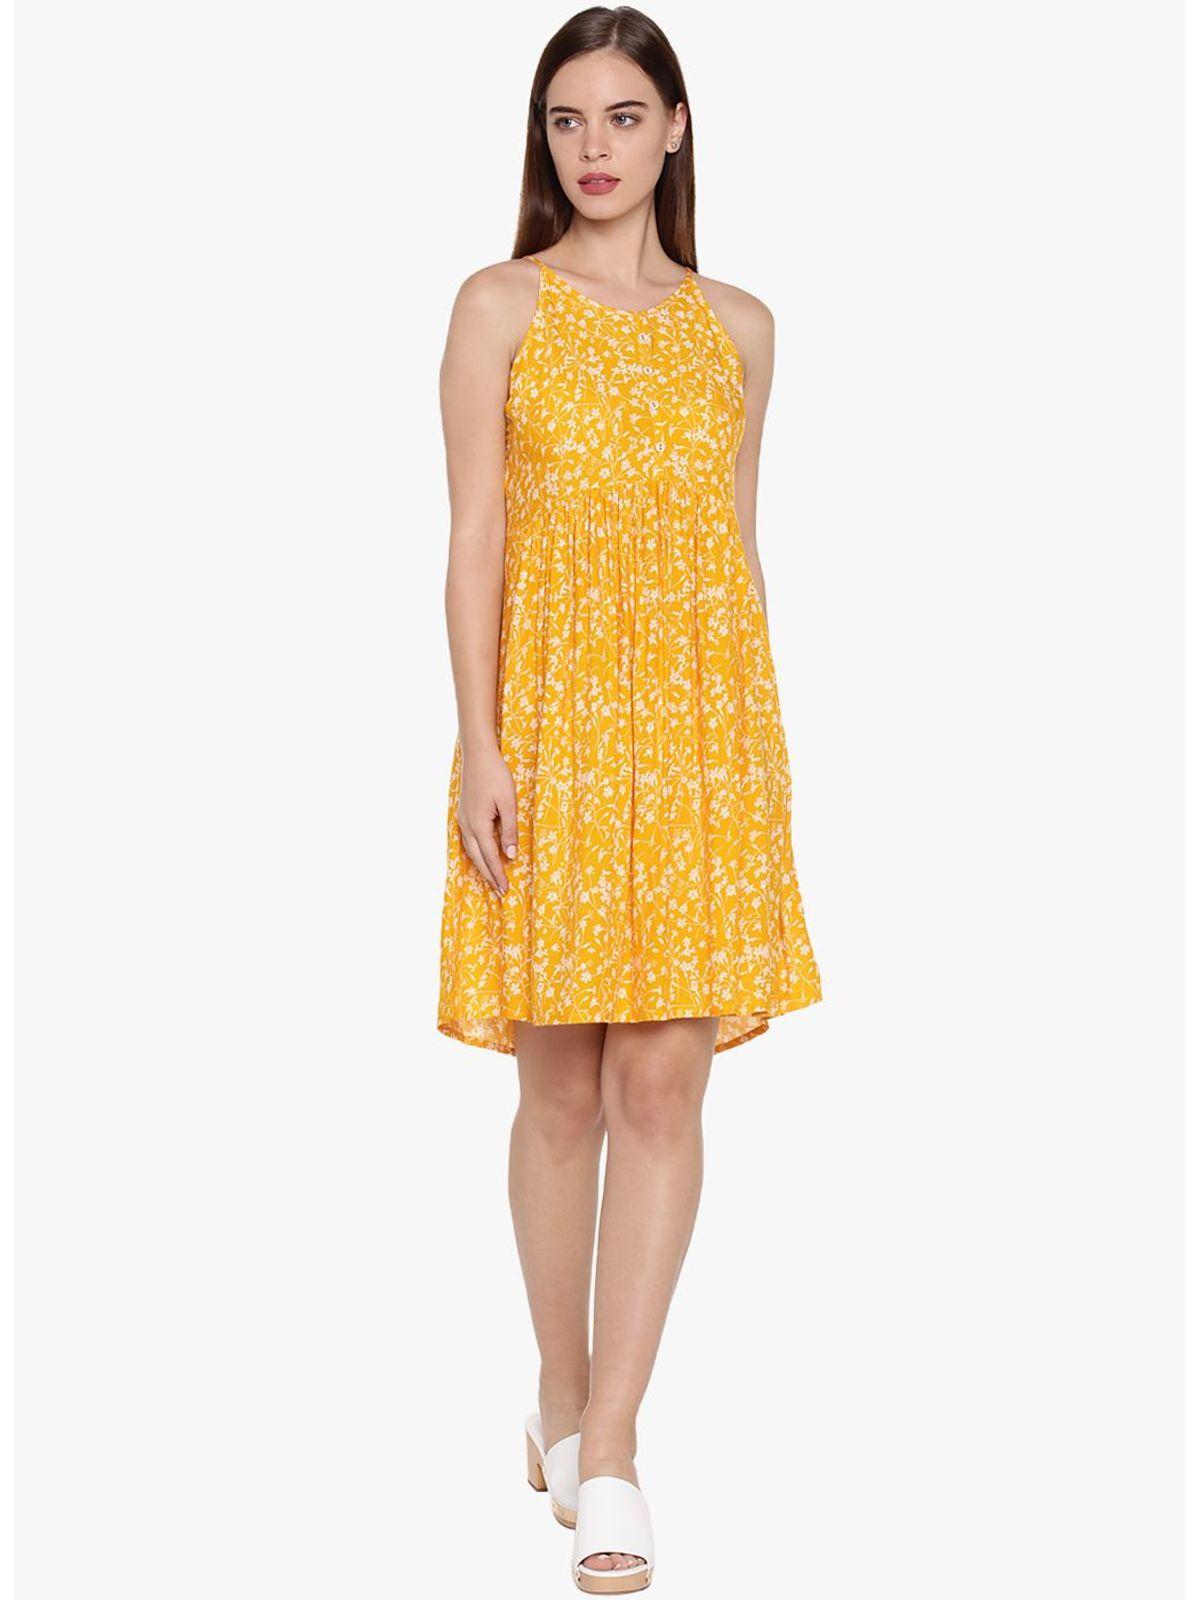 LIONA FLORAL DRESS